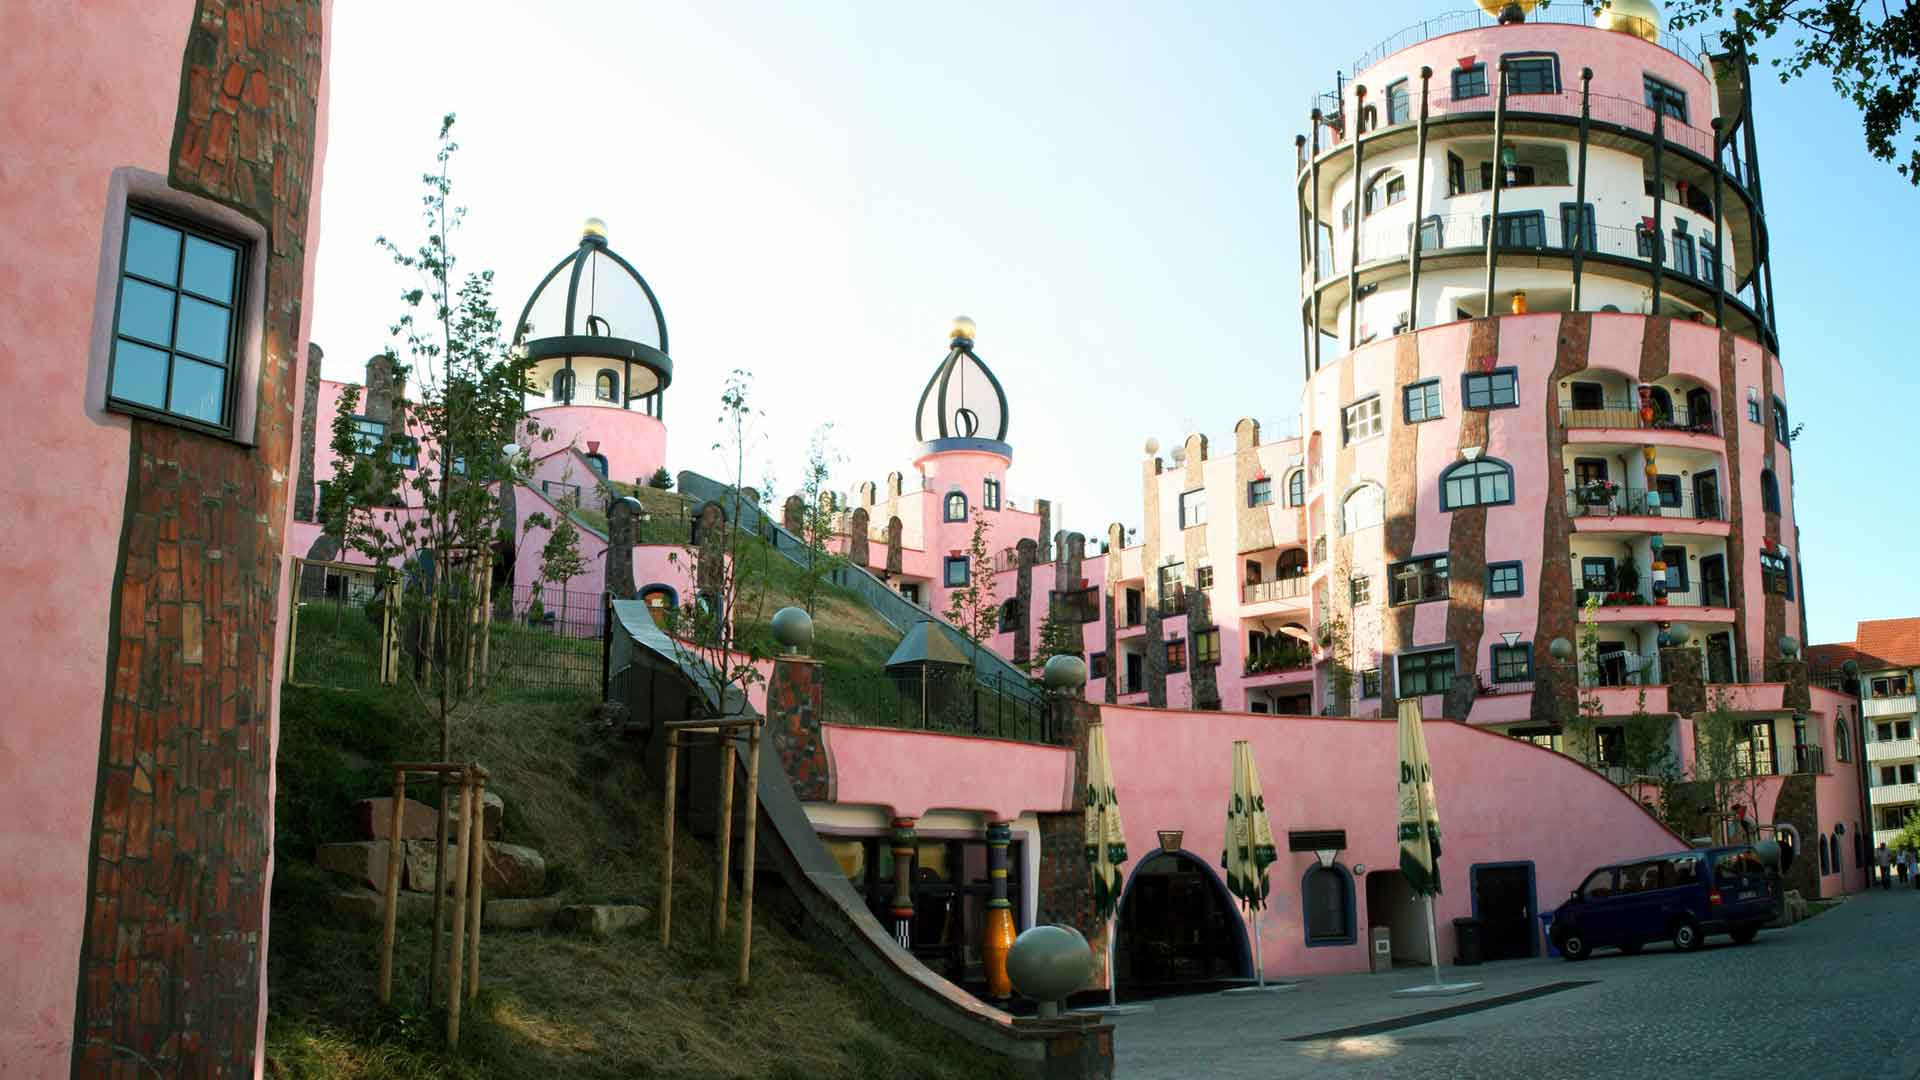 Die Grüne Zitadelle van Hundertwasser in Magdeburg